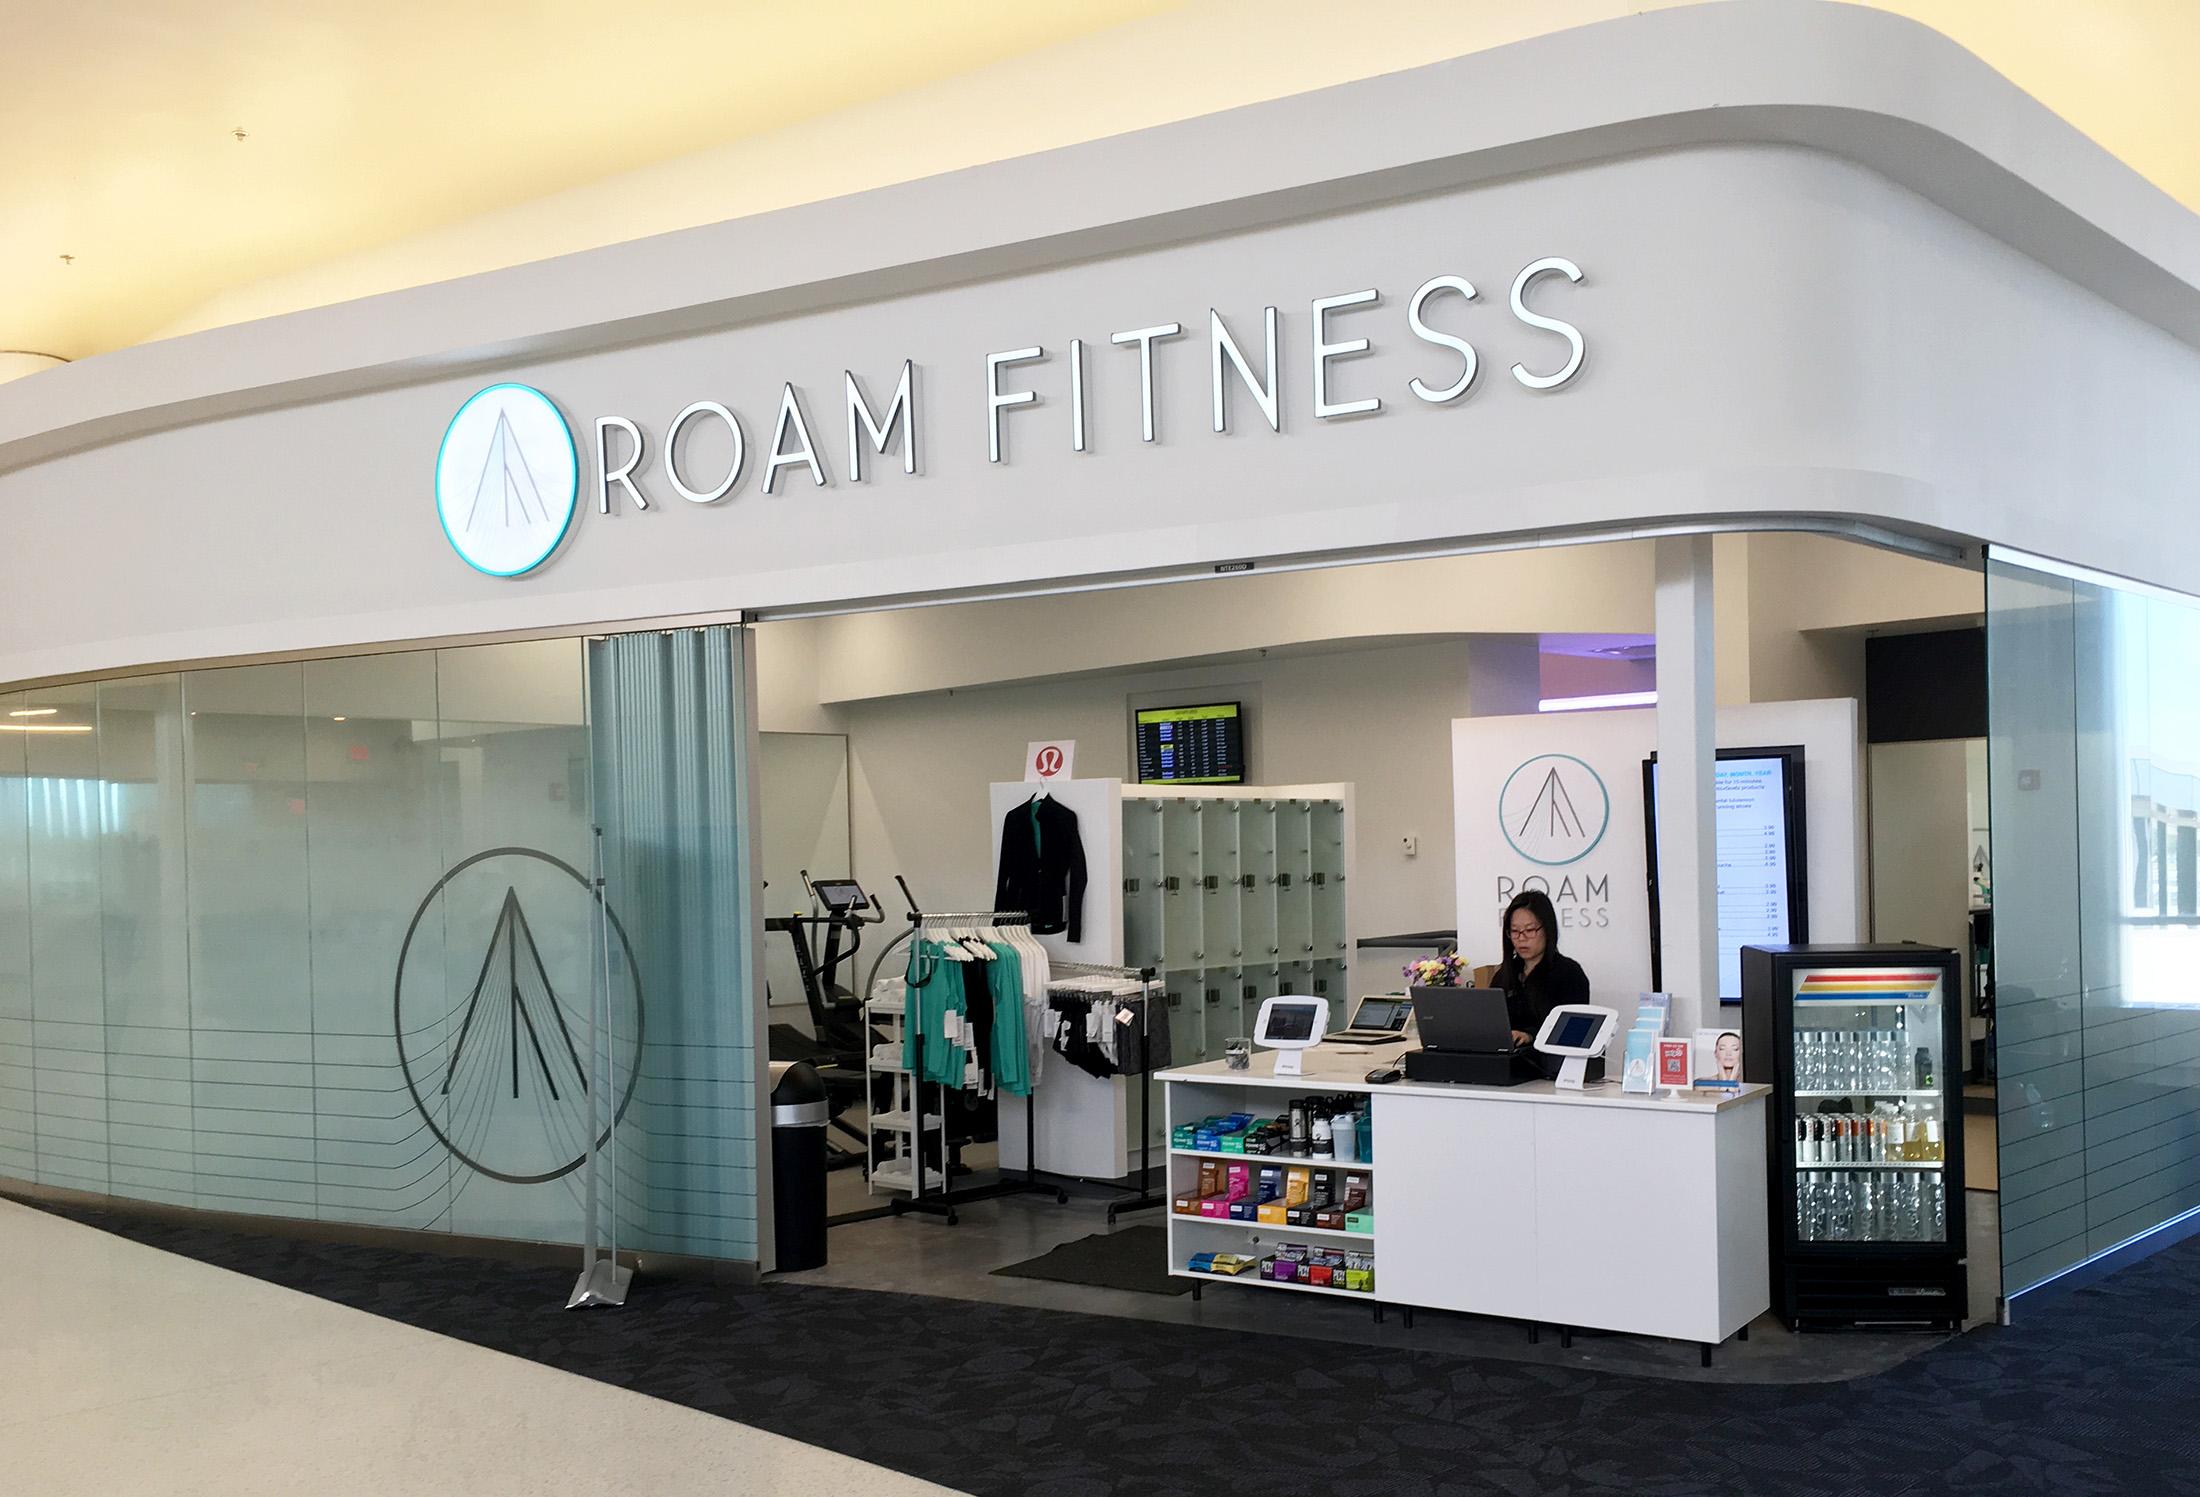 ROAM Fitness|ROAM Fitness